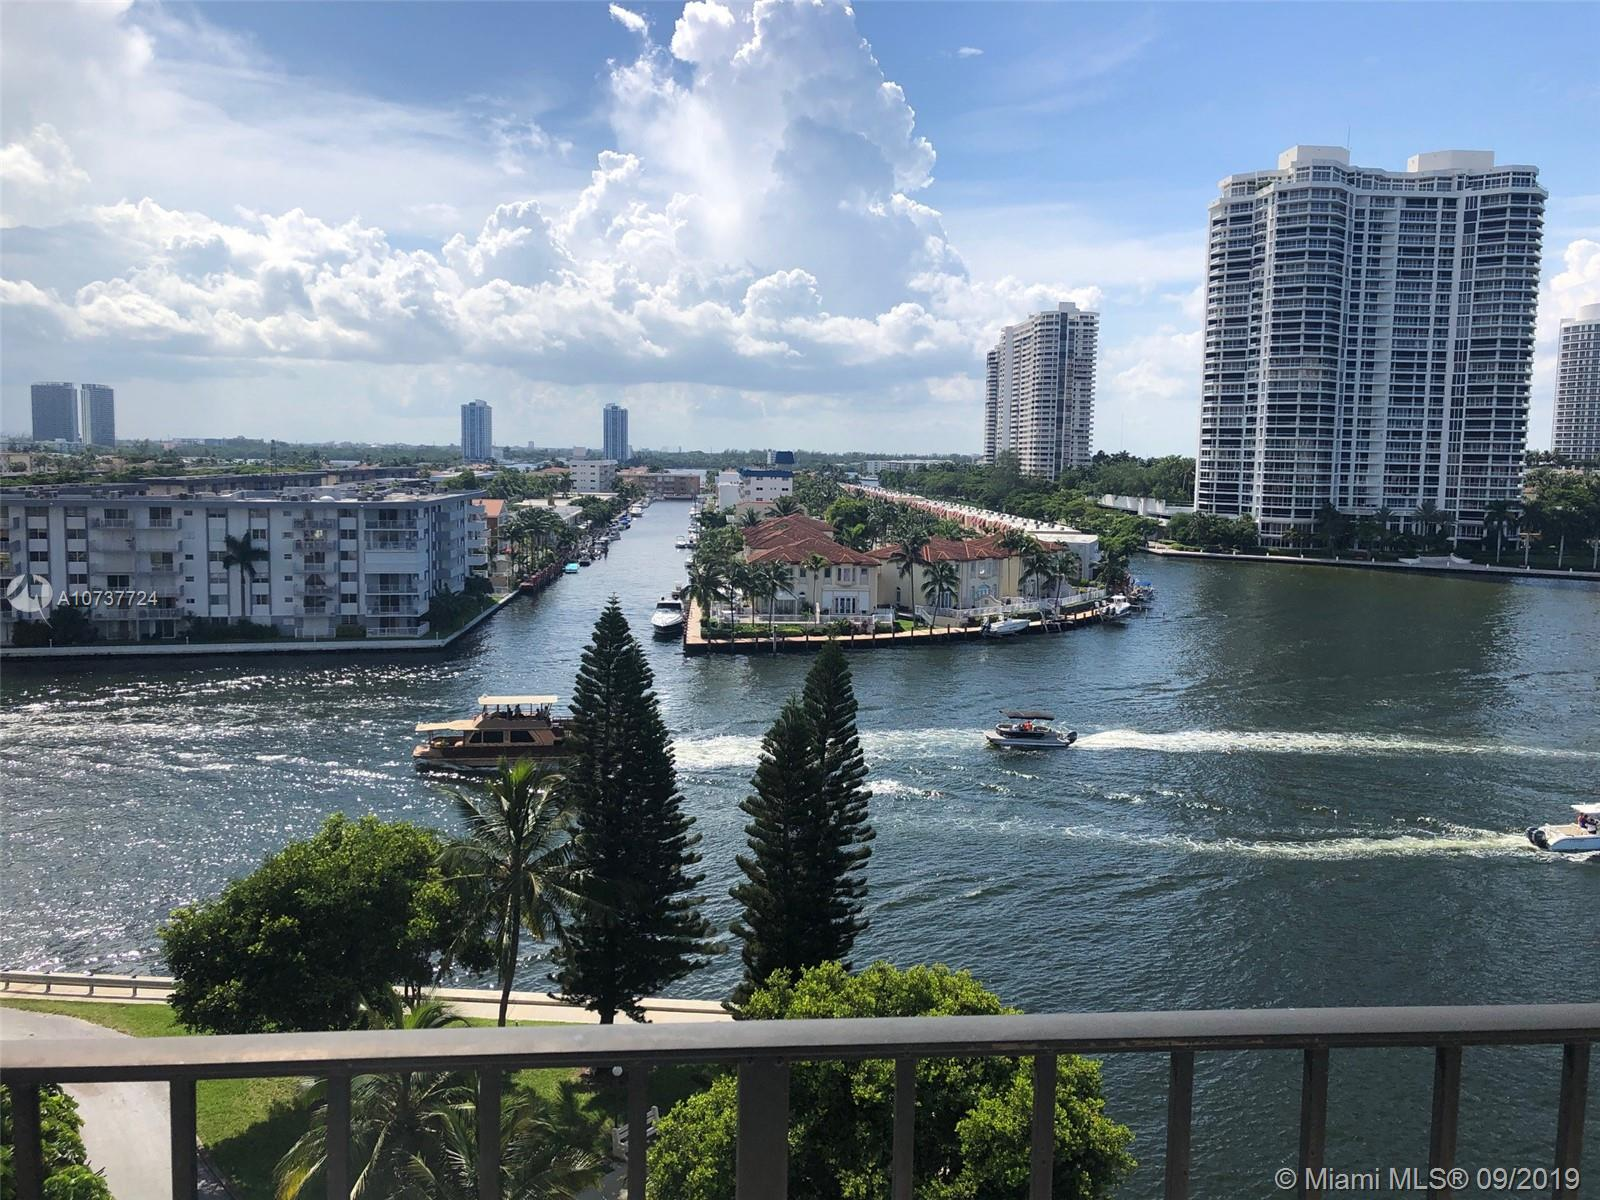 301 174th St #919, Sunny Isles Beach, FL 33160 - Sunny Isles Beach, FL real estate listing